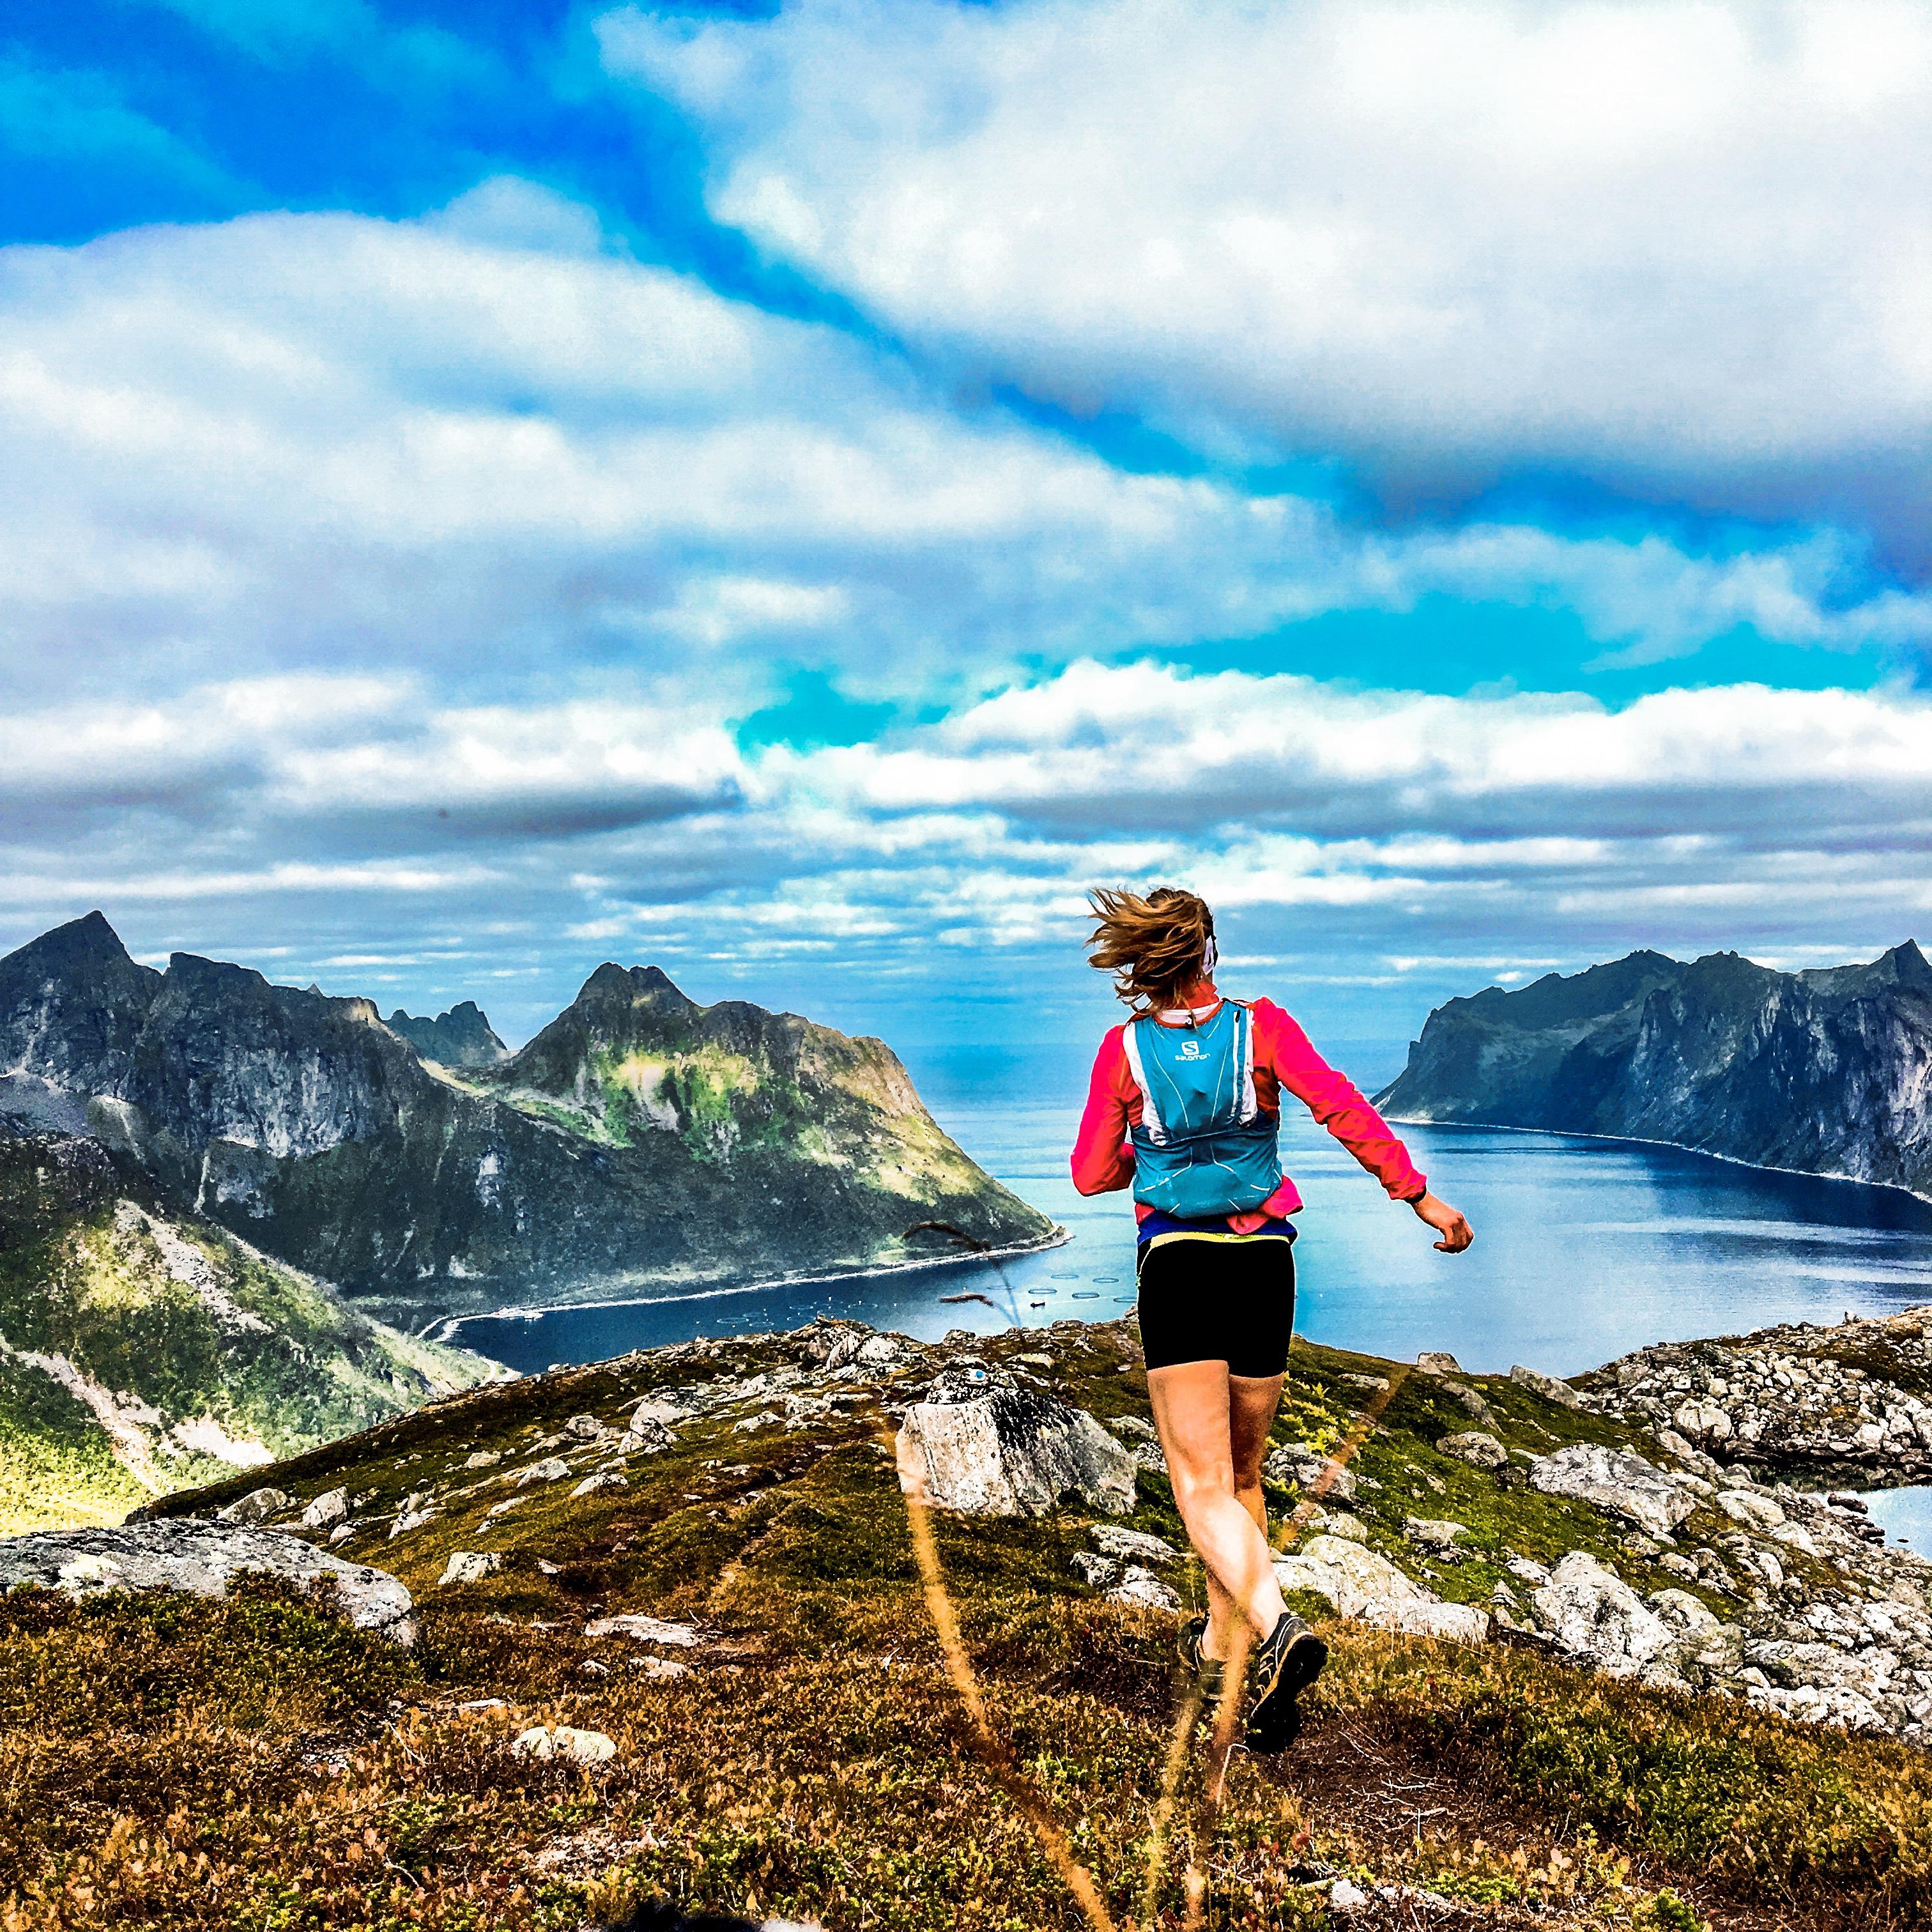 Senja – Segla, Hesten and (almost) Breidtinden – Trailspotting